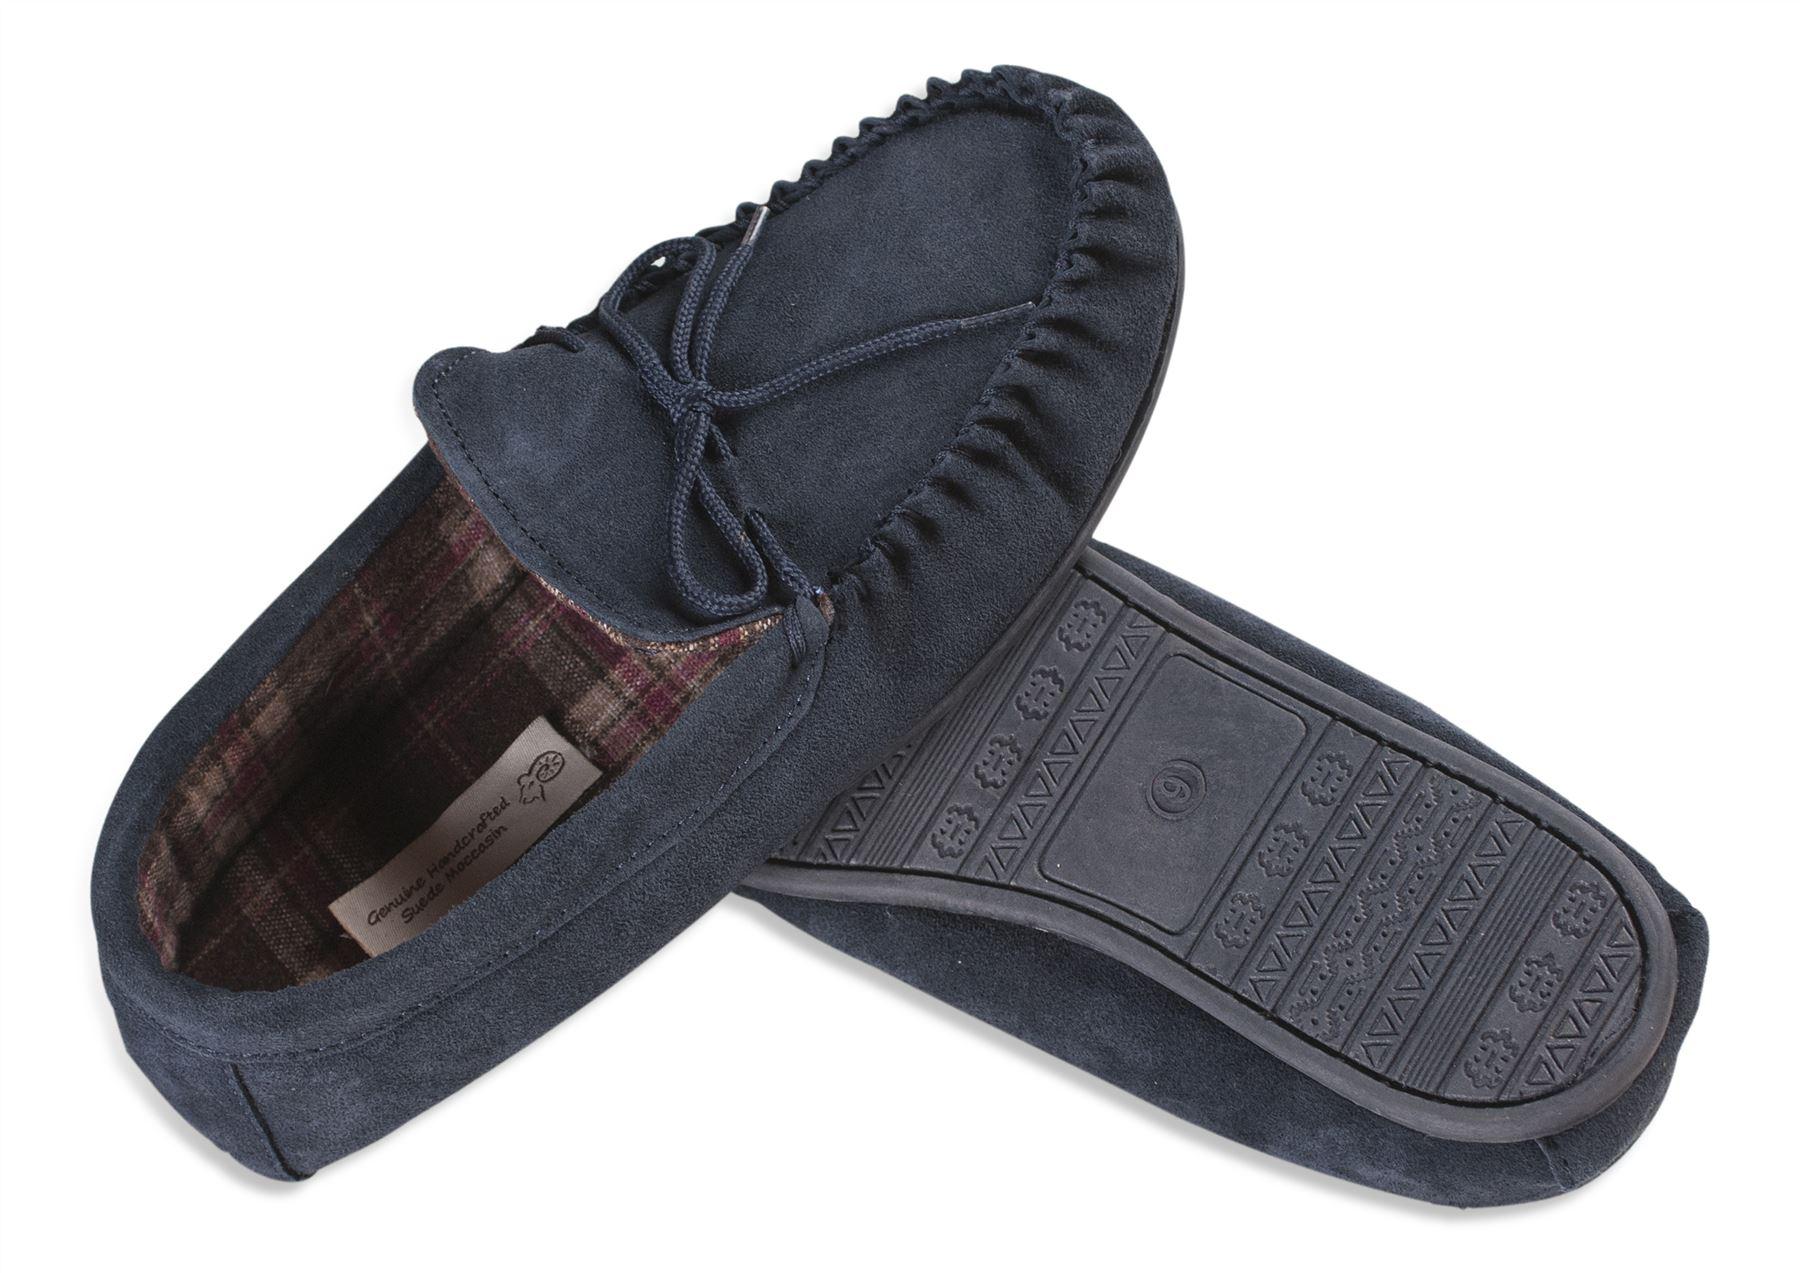 how to make slippers non slip